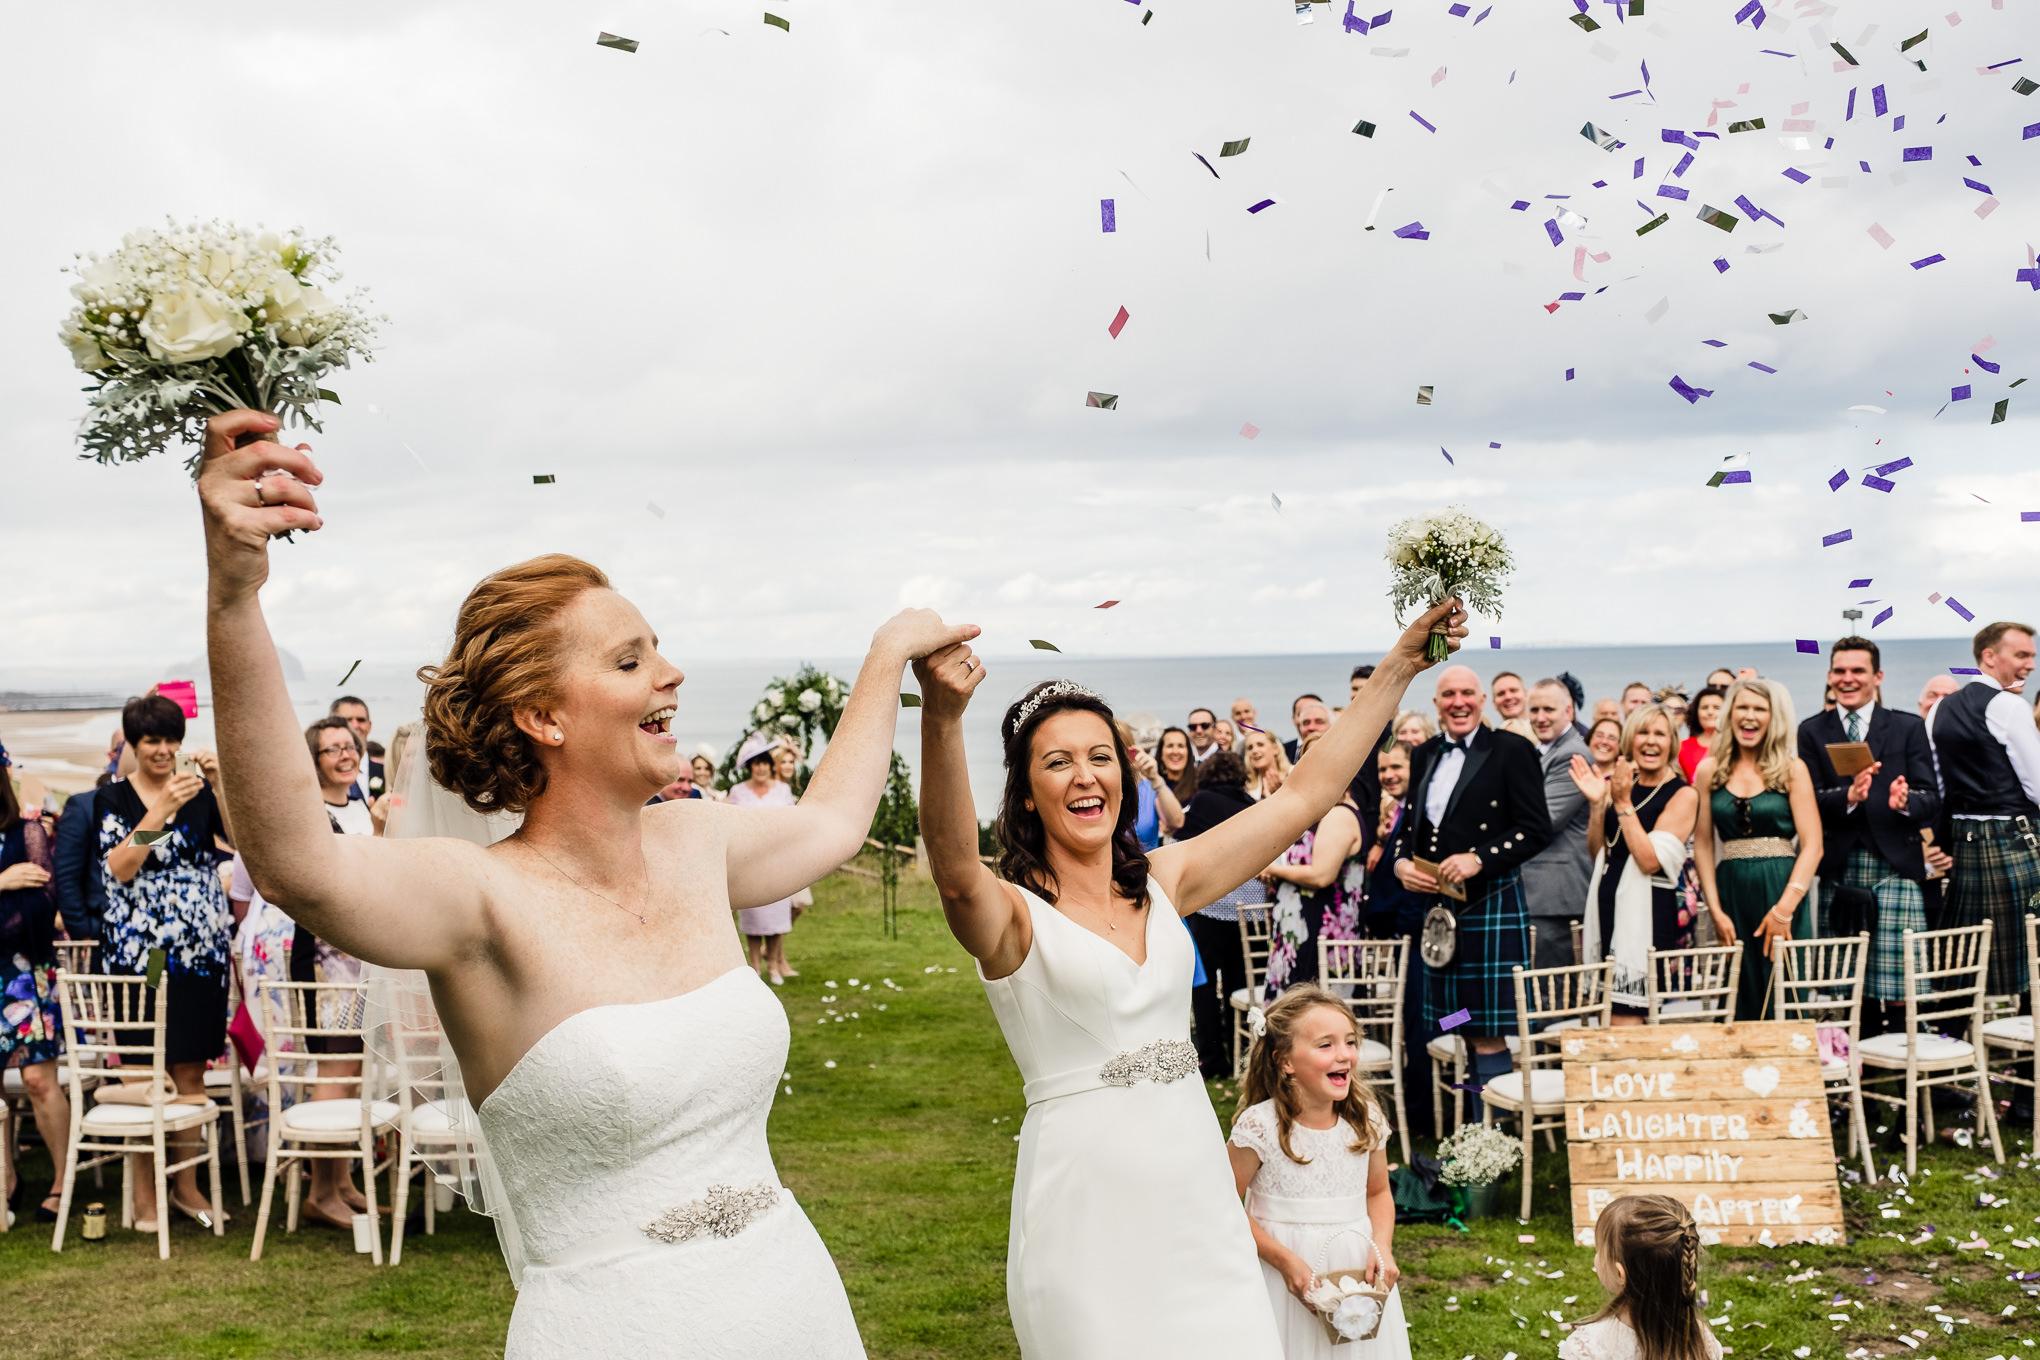 20170729_euan robertson weddings_037.jpg